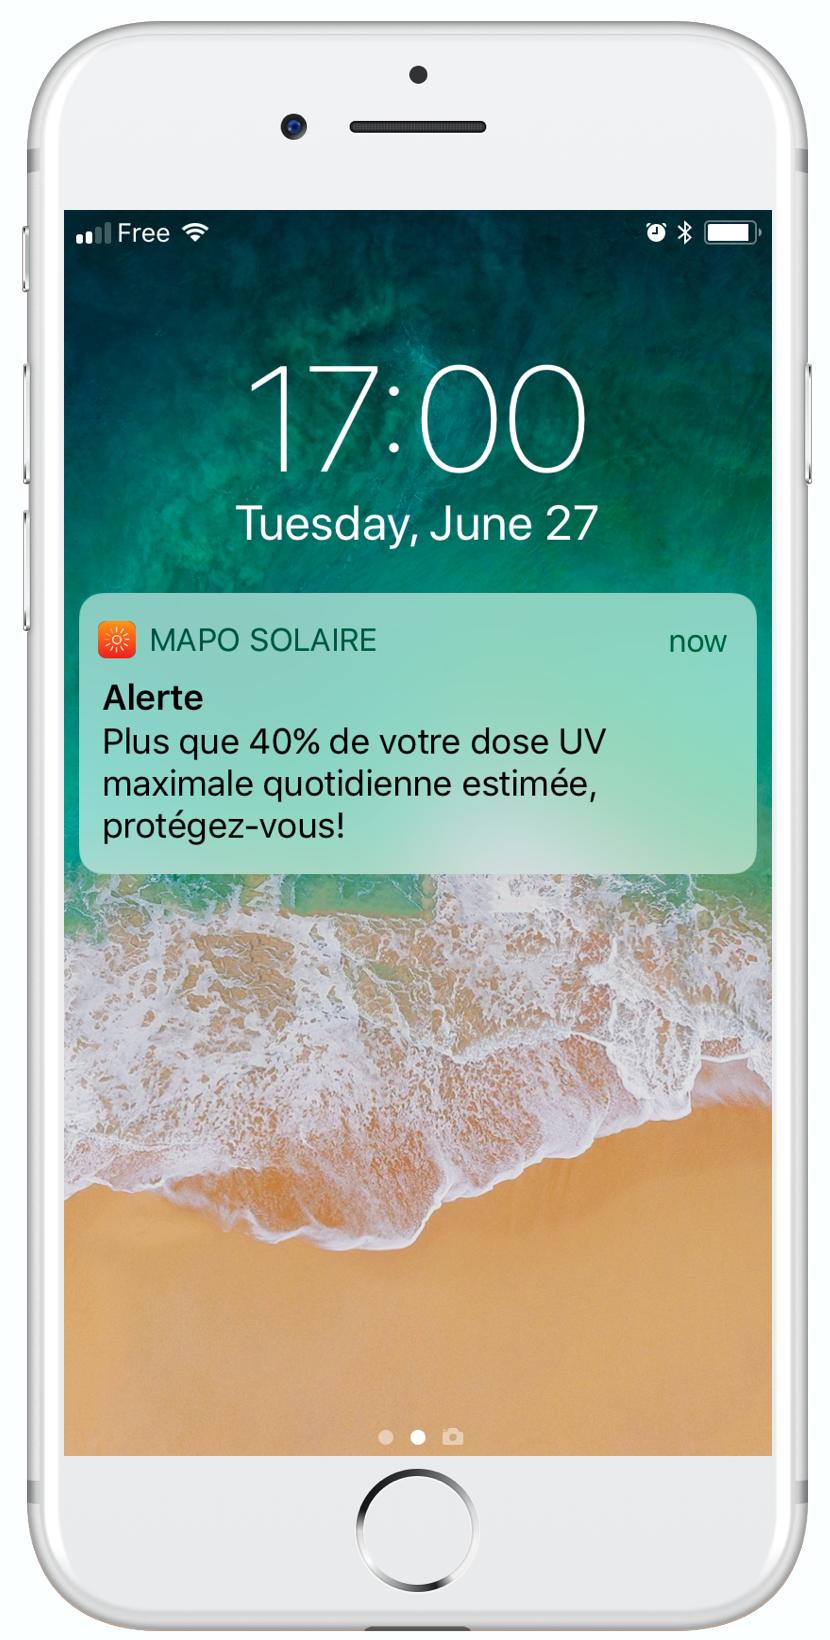 alert-daily-dose-60-fr.png